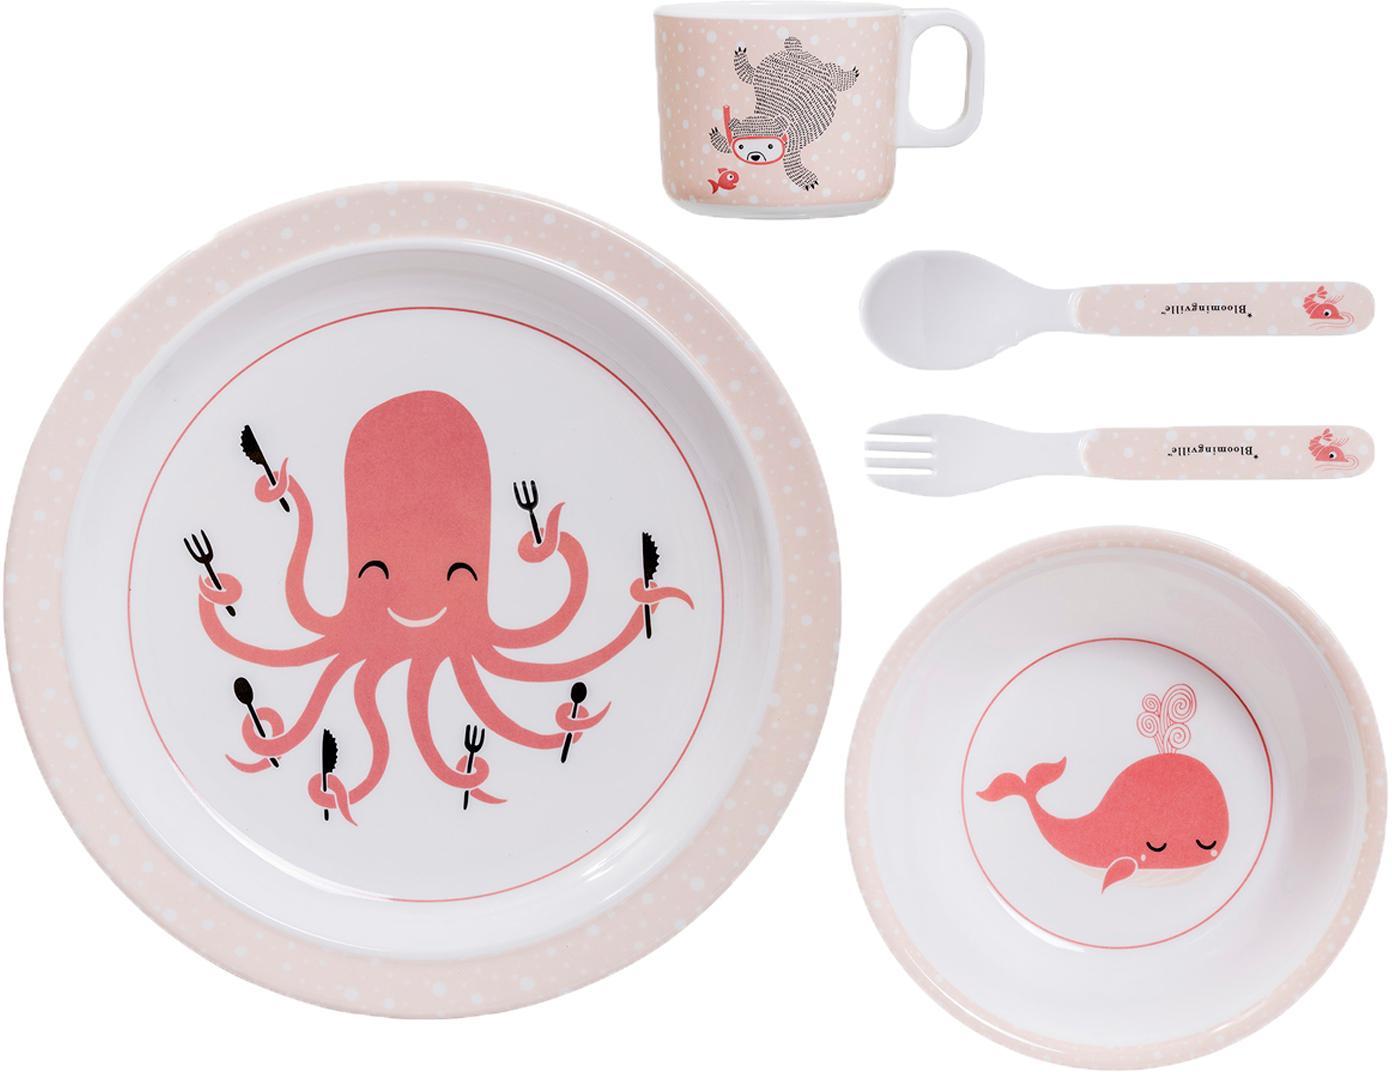 Set piatti Ida, 5 pz., Melamina, Tonalità rosa, bianco, nero, Diverse dimensioni